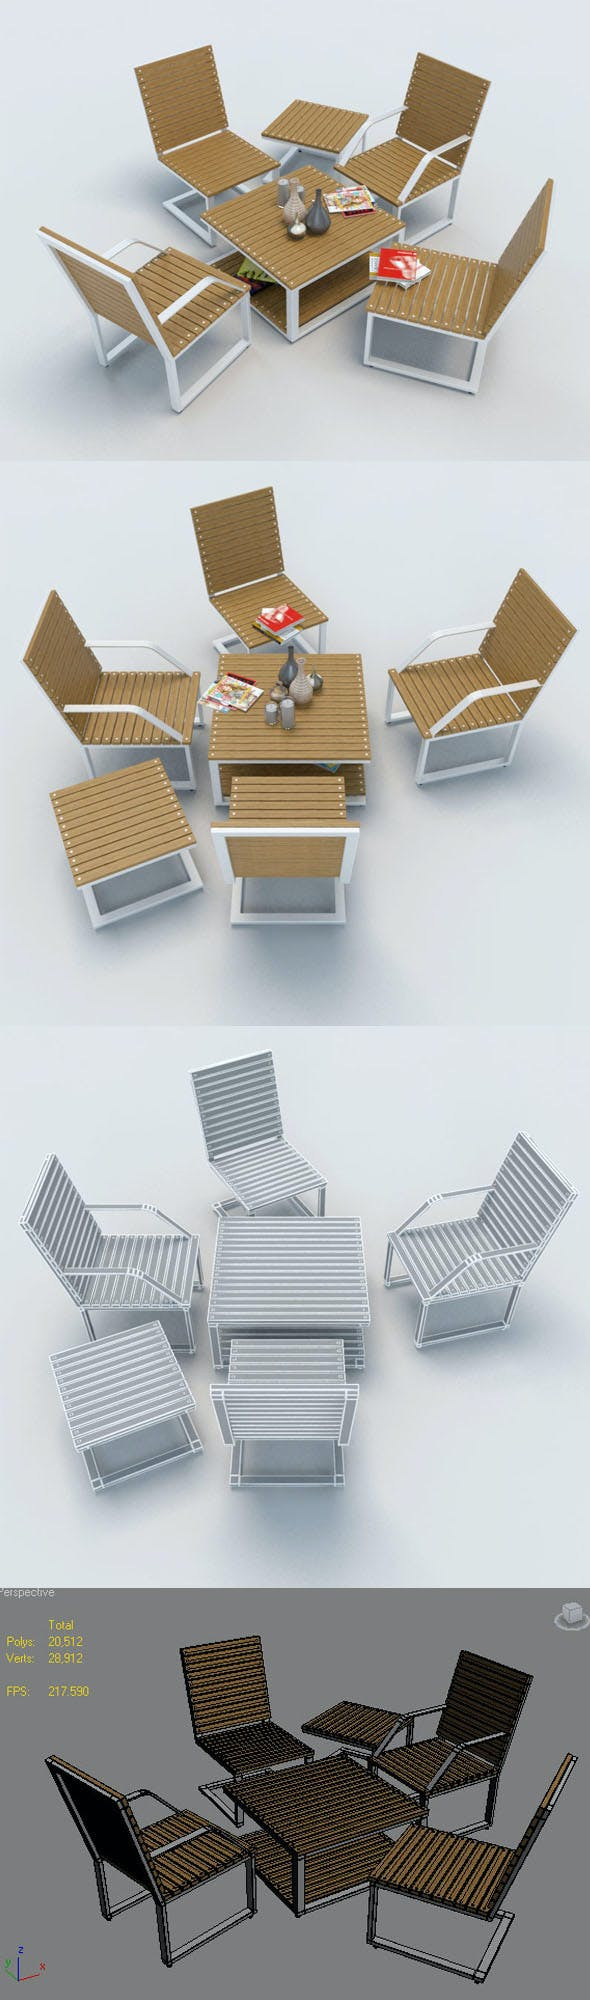 OUTDOOR FURNITURE-1 - 3DOcean Item for Sale